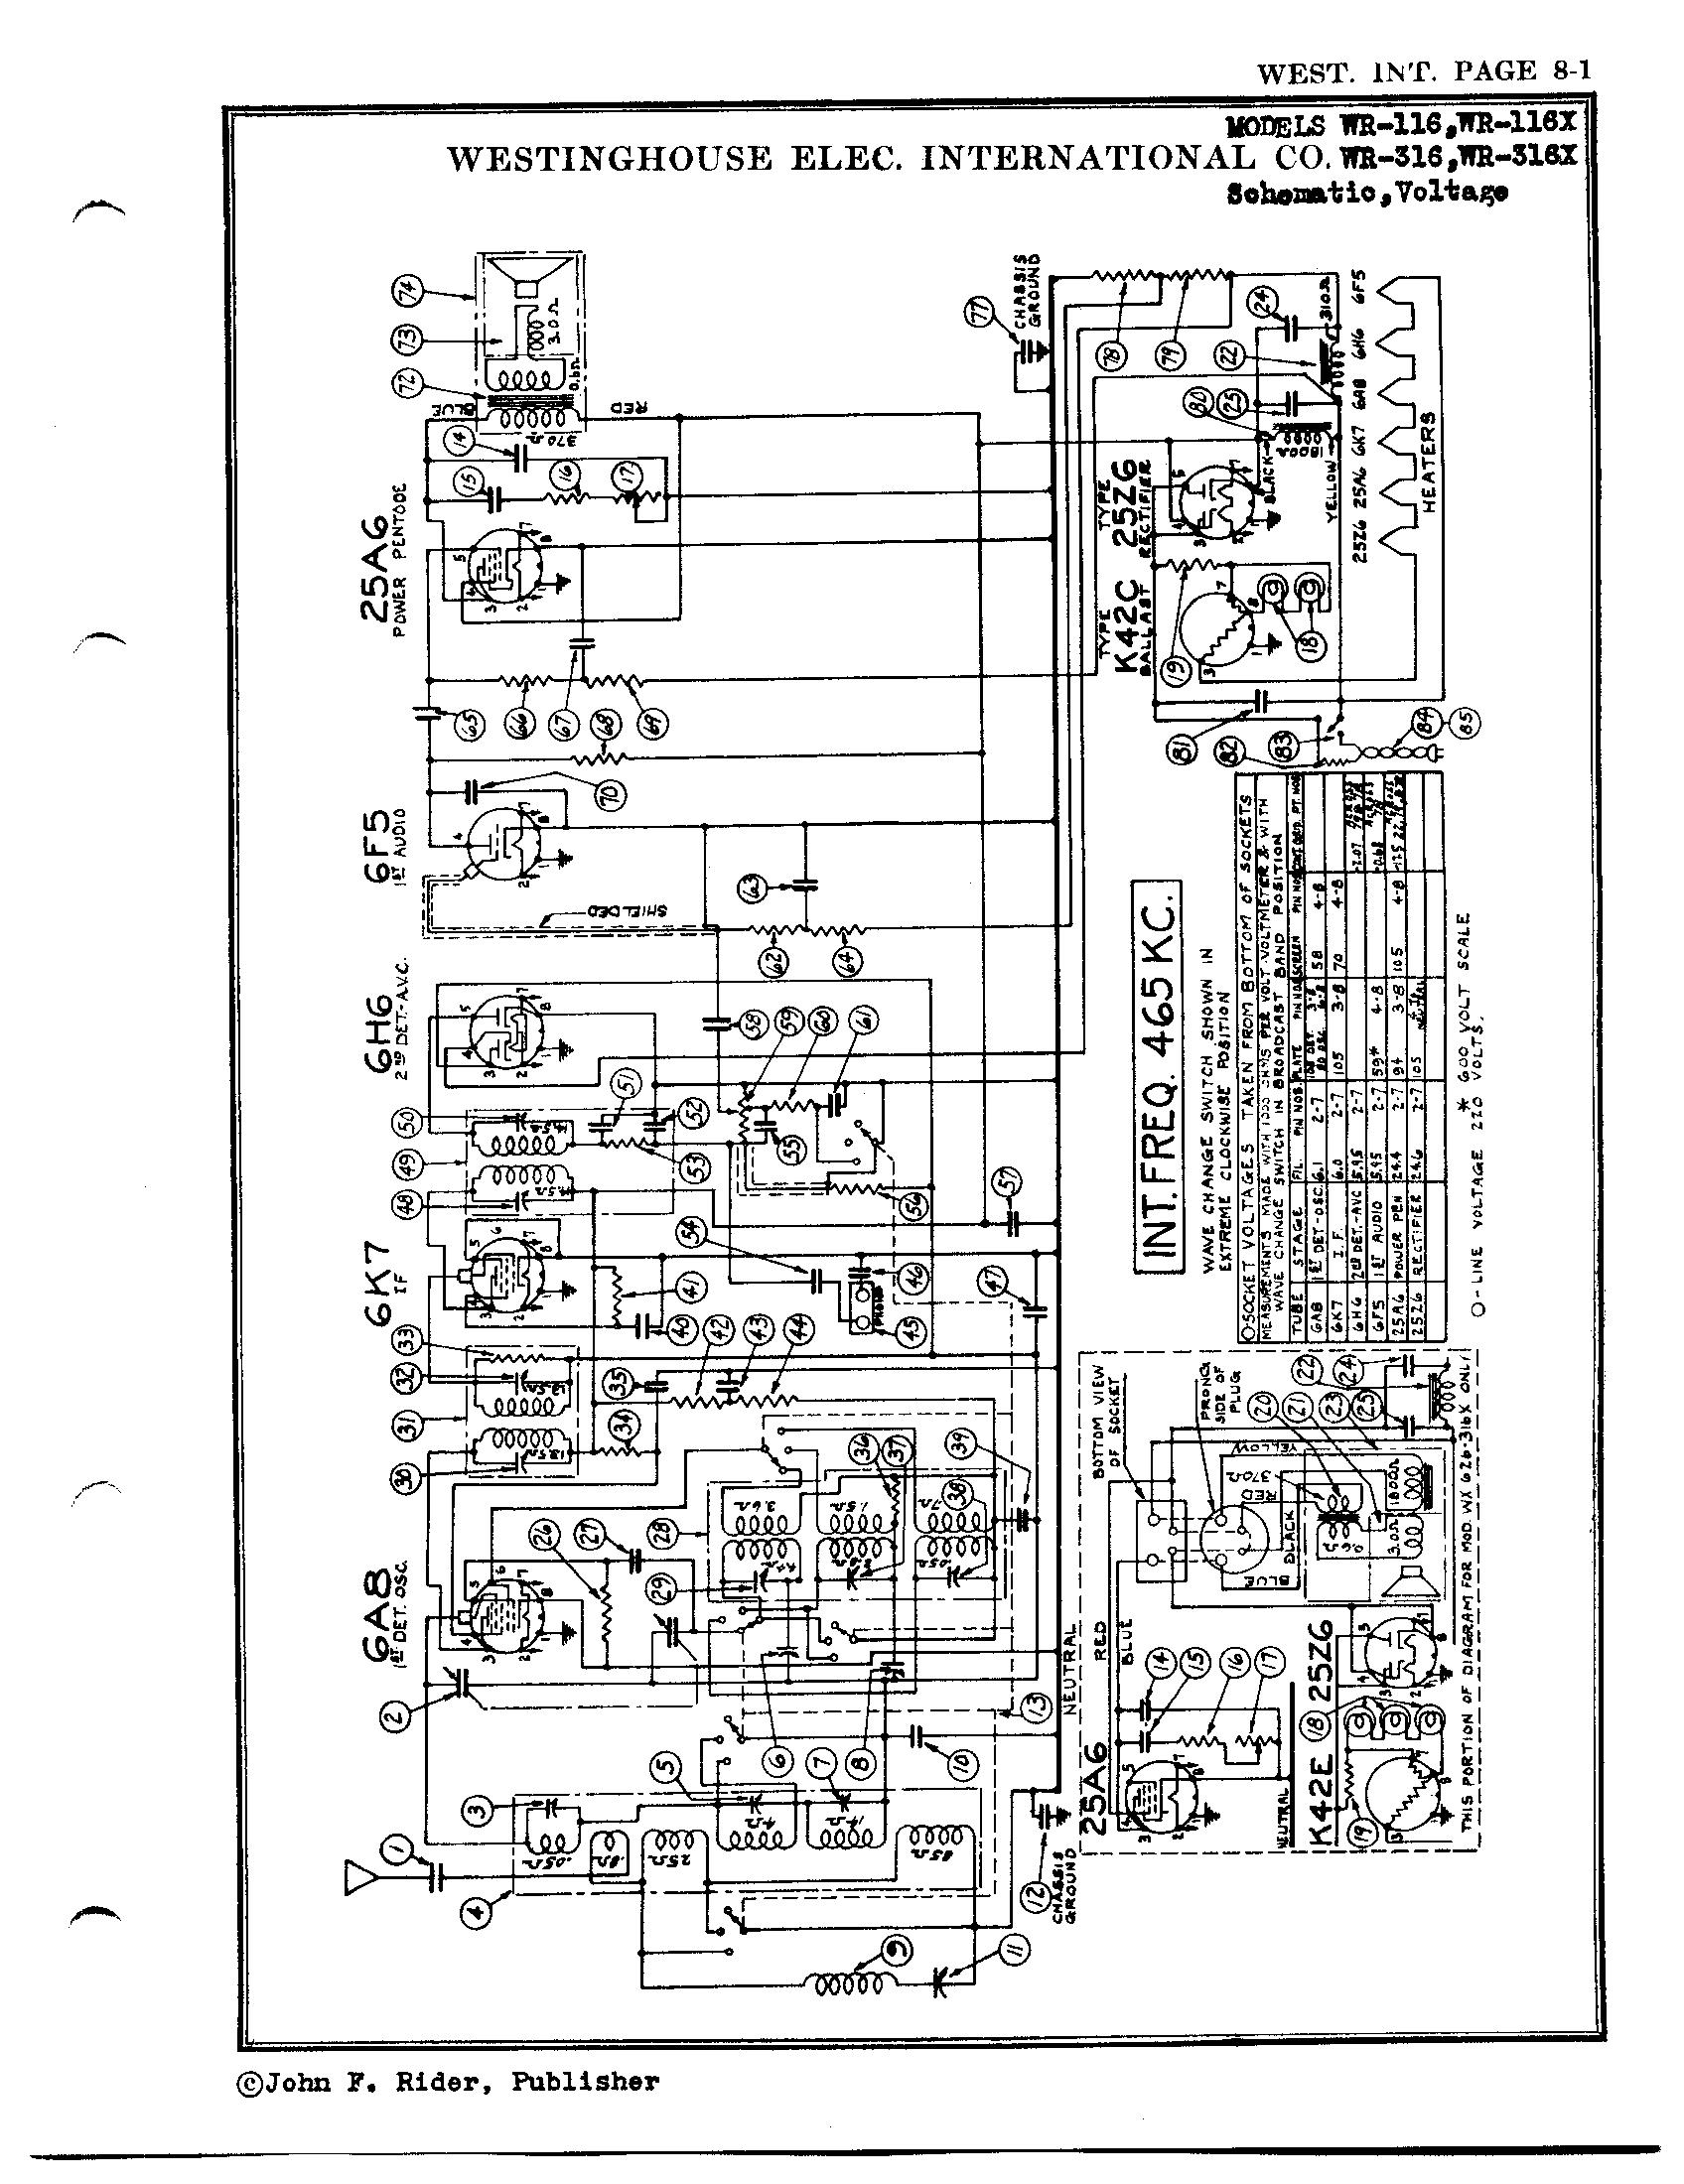 circuit breaker wiring diagram schematics westinghouse circuit breaker wiring diagram circuit breaker wiring diagram pdf westinghouse circuit breaker wiring diagram